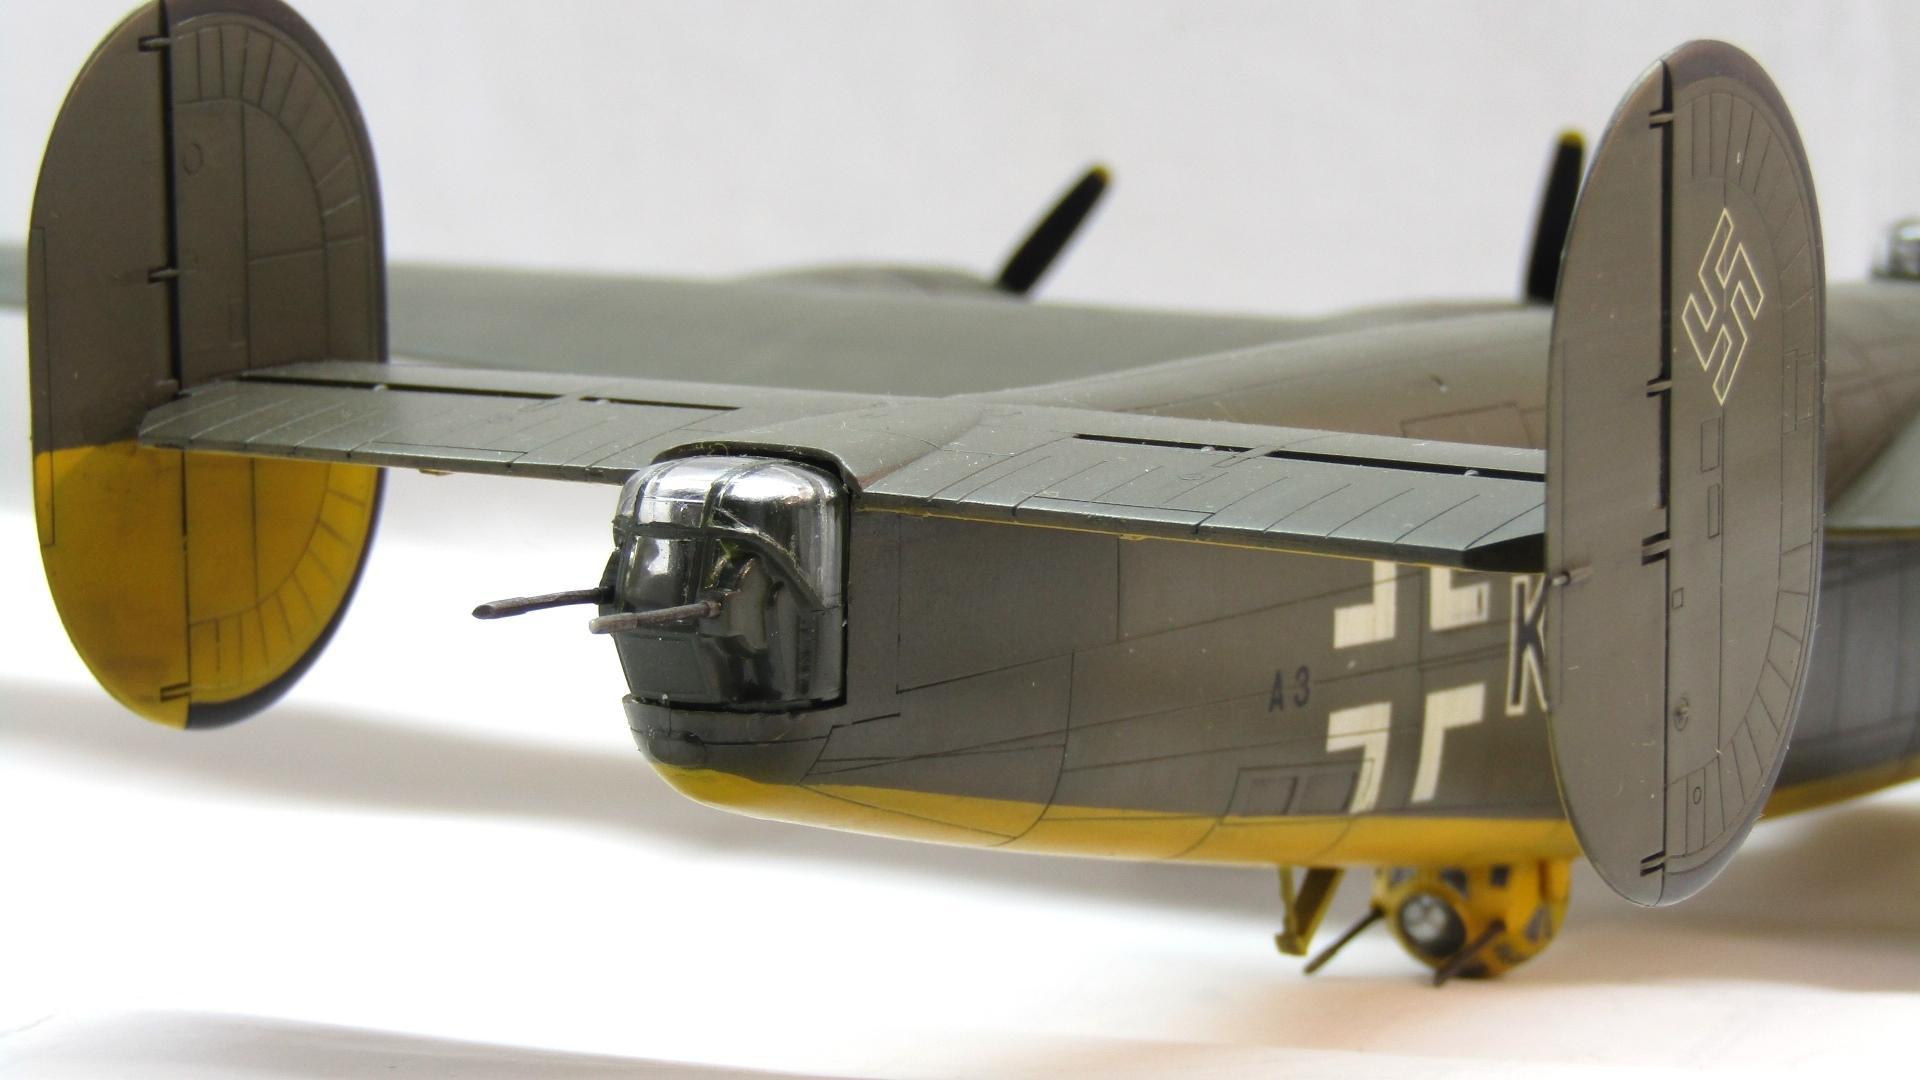 B-24H Liberator 1/72 (Academy) AS4lNUOoTk4